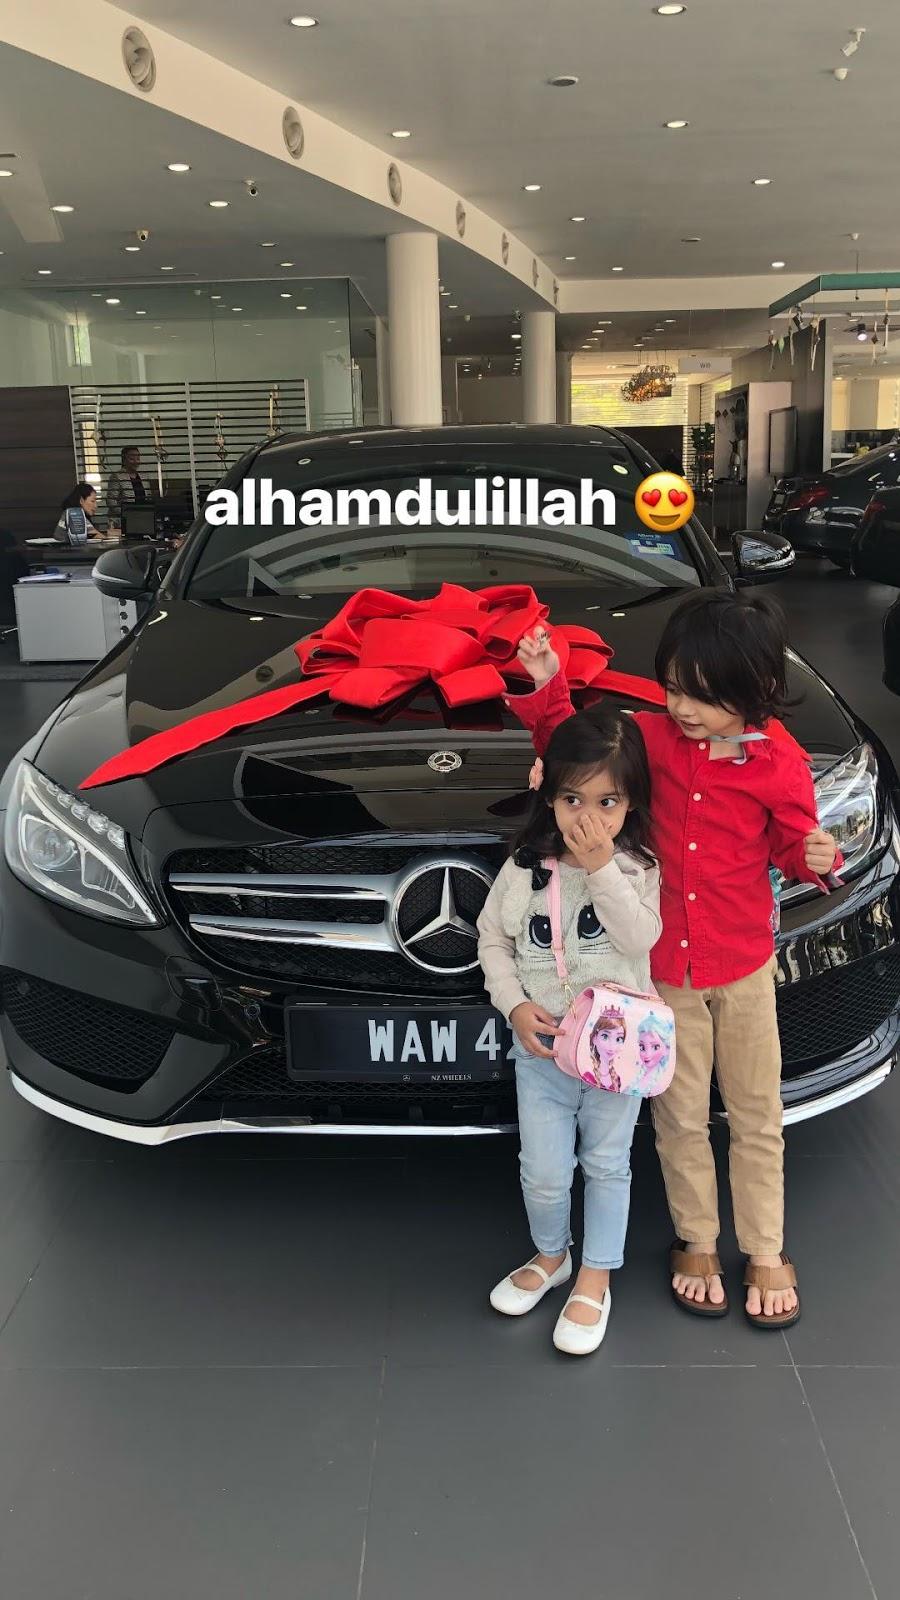 Ganjaran jaga suami & anak-anak, Aeril Zafrel hadiakan kereta mewah buat Wawa Zainal